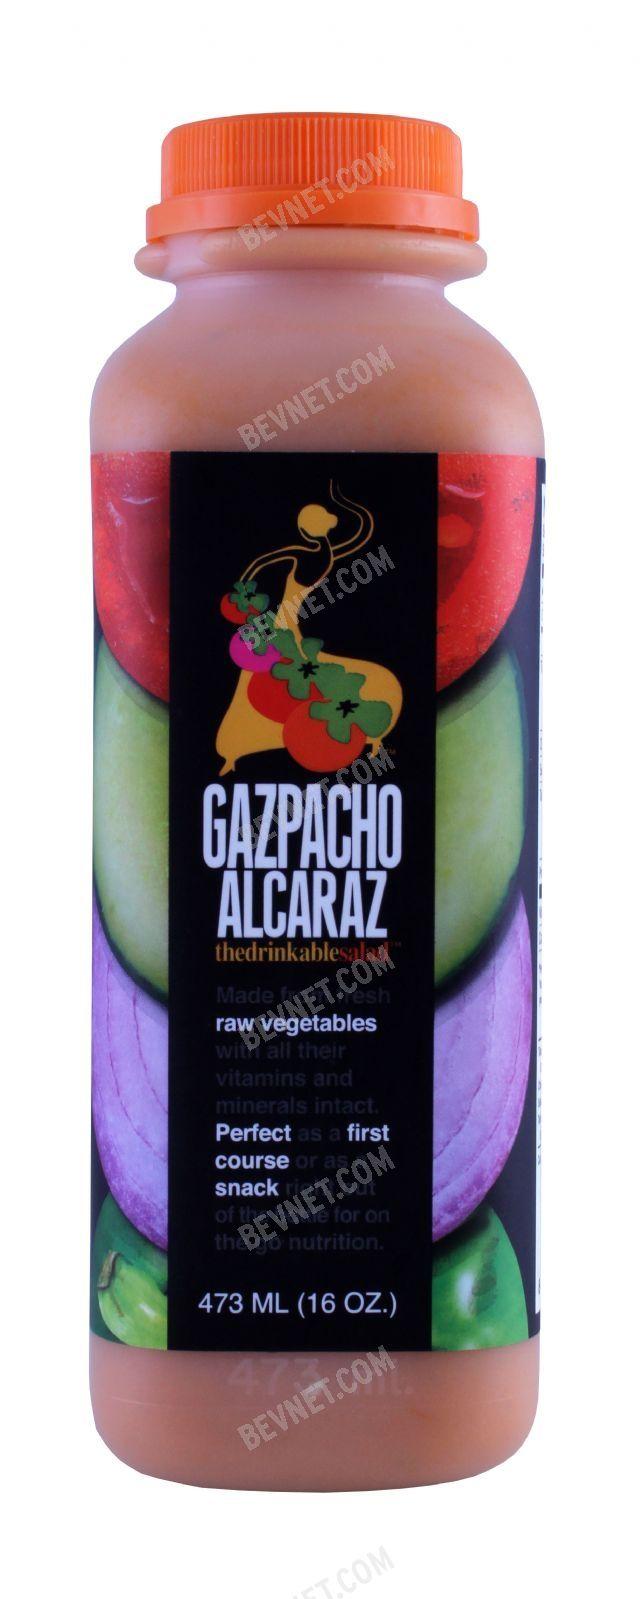 Gazpacho Alcaraz, The Drinkable Salad: